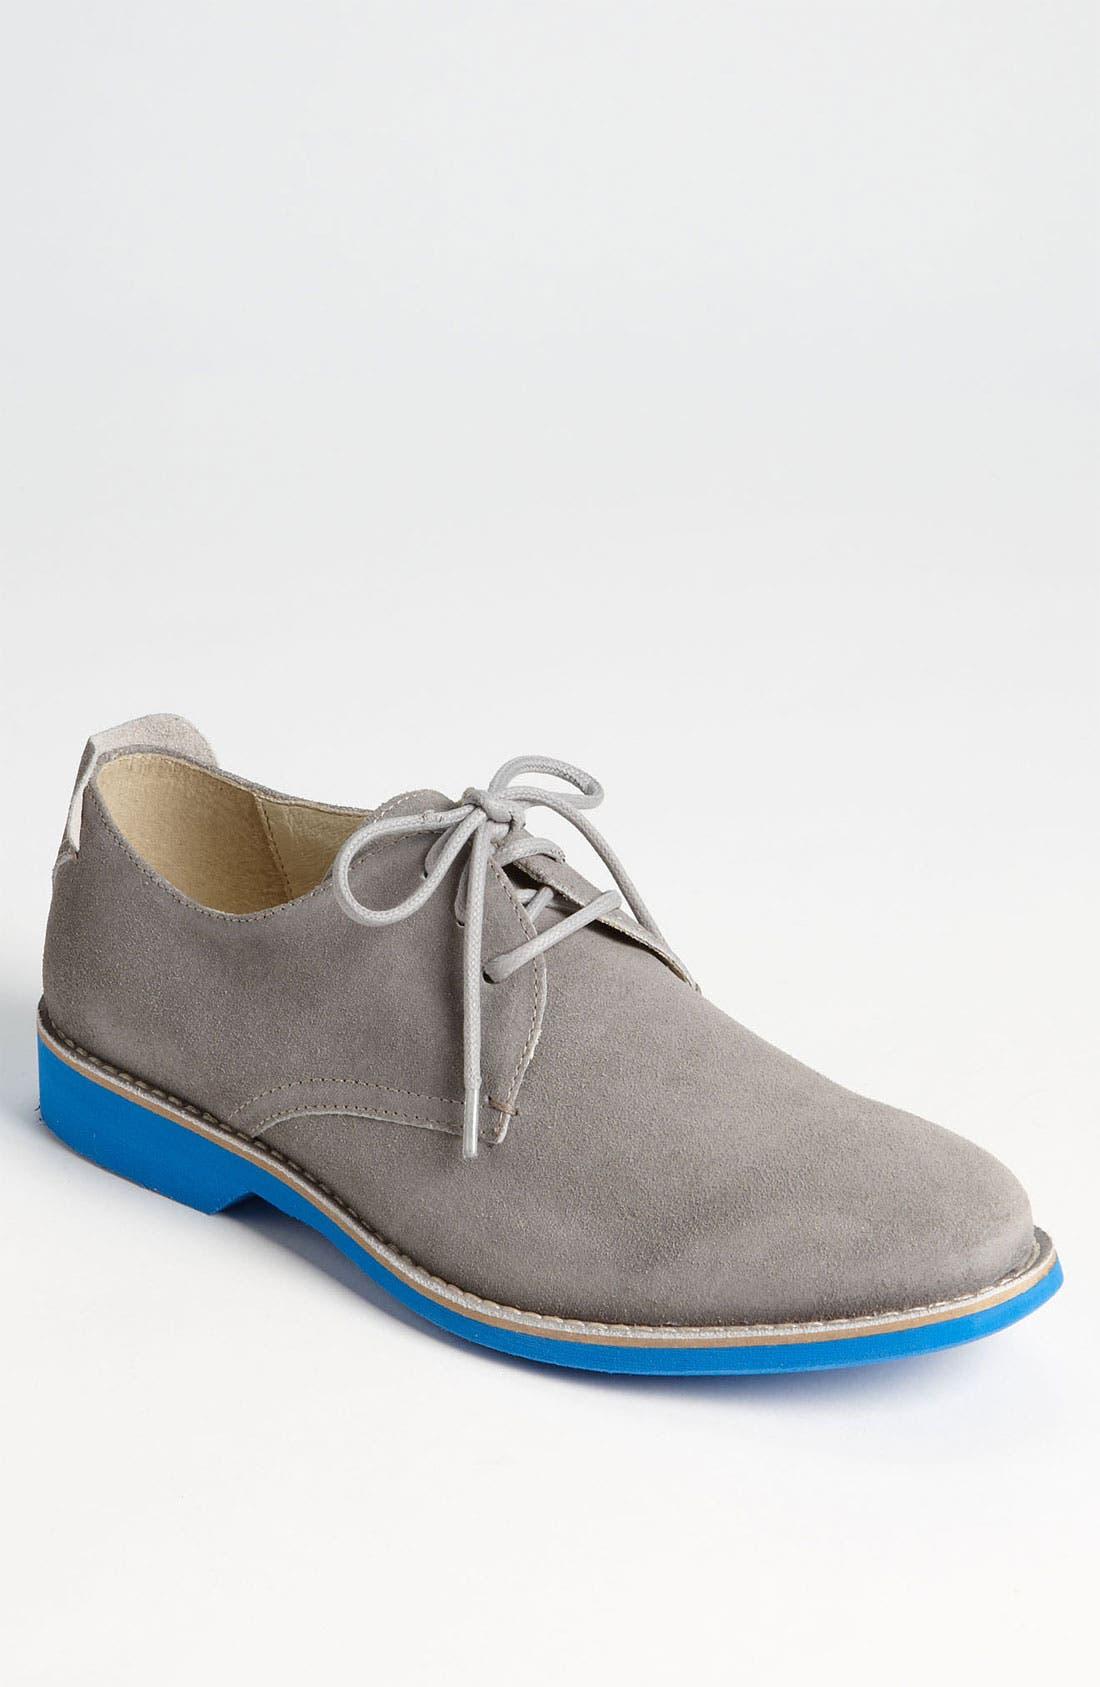 Main Image - ALDO 'Arkin' Buck Shoe